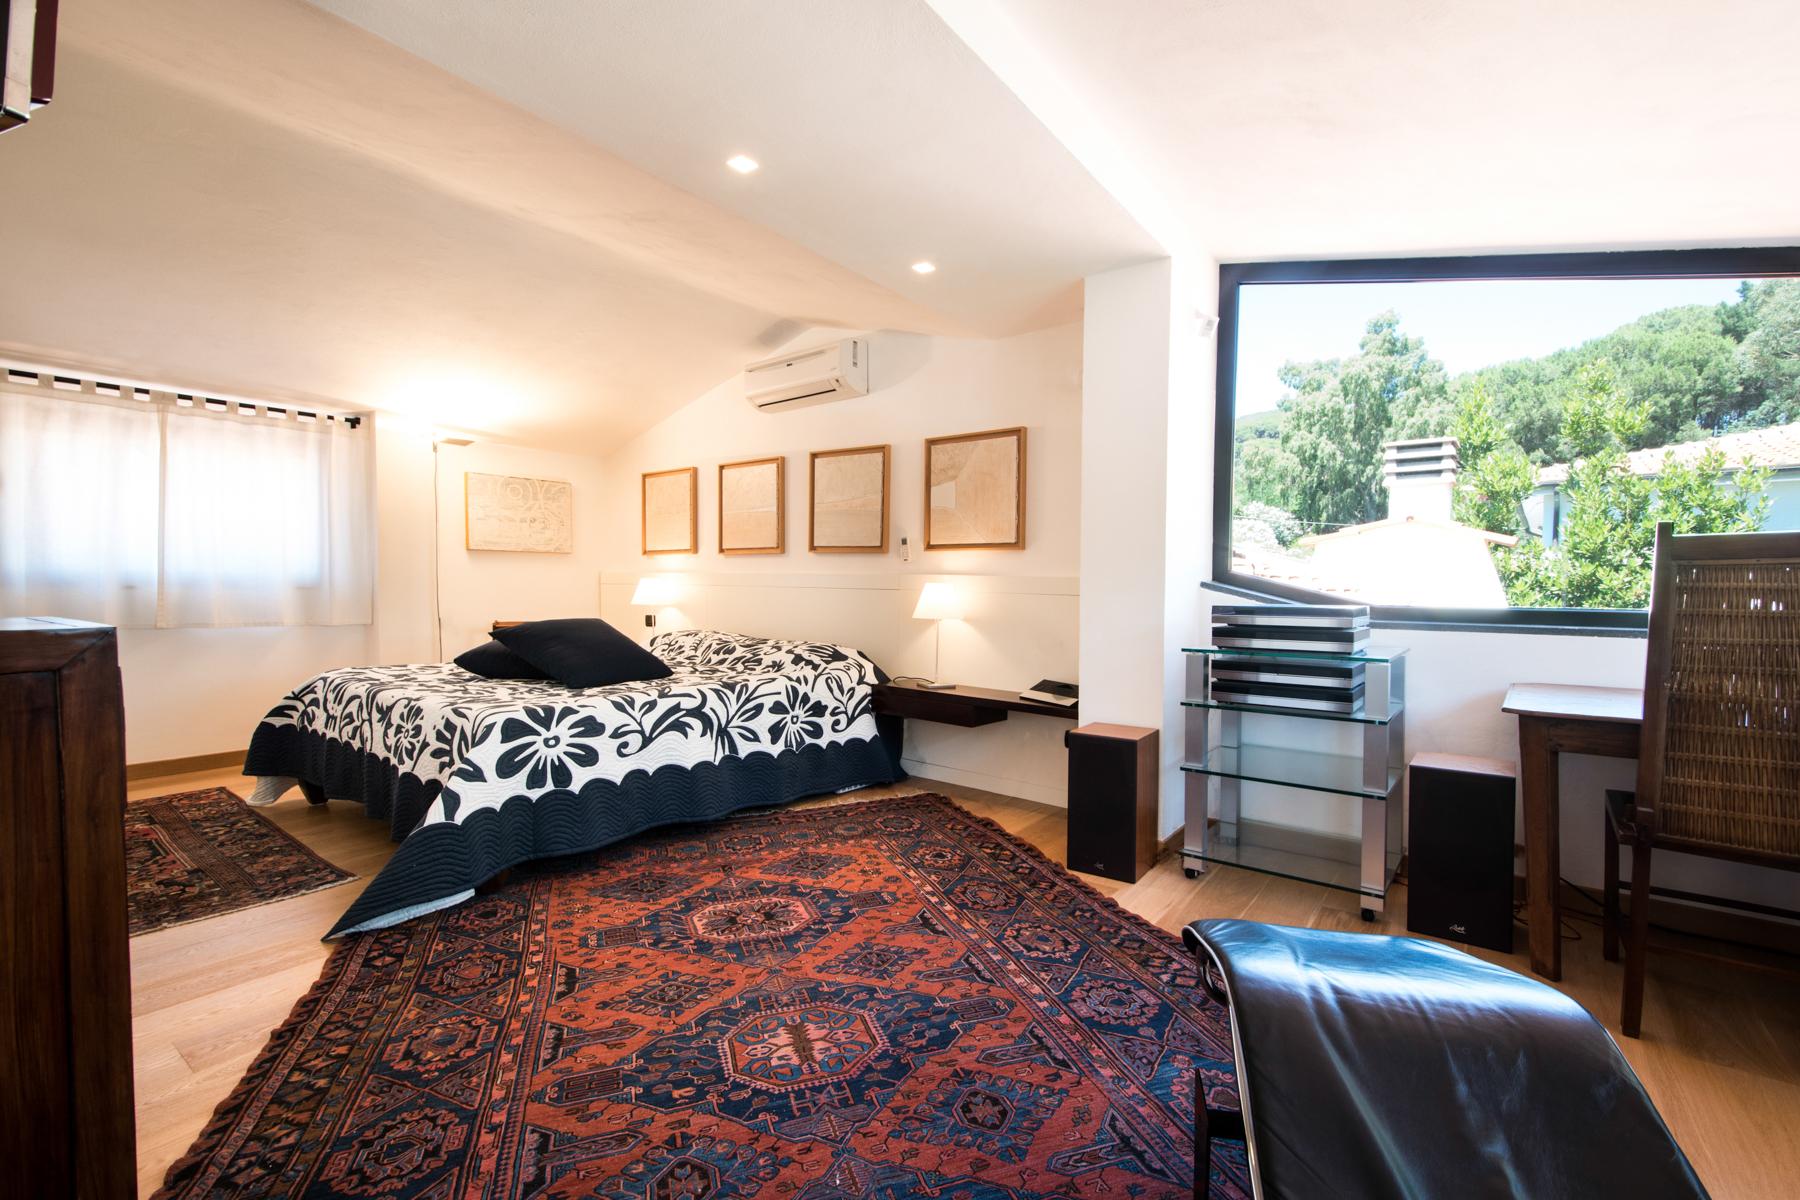 Additional photo for property listing at Discreet villa with garden on Elba Via Murzi Marciana Marina, Livorno 57033 Italy